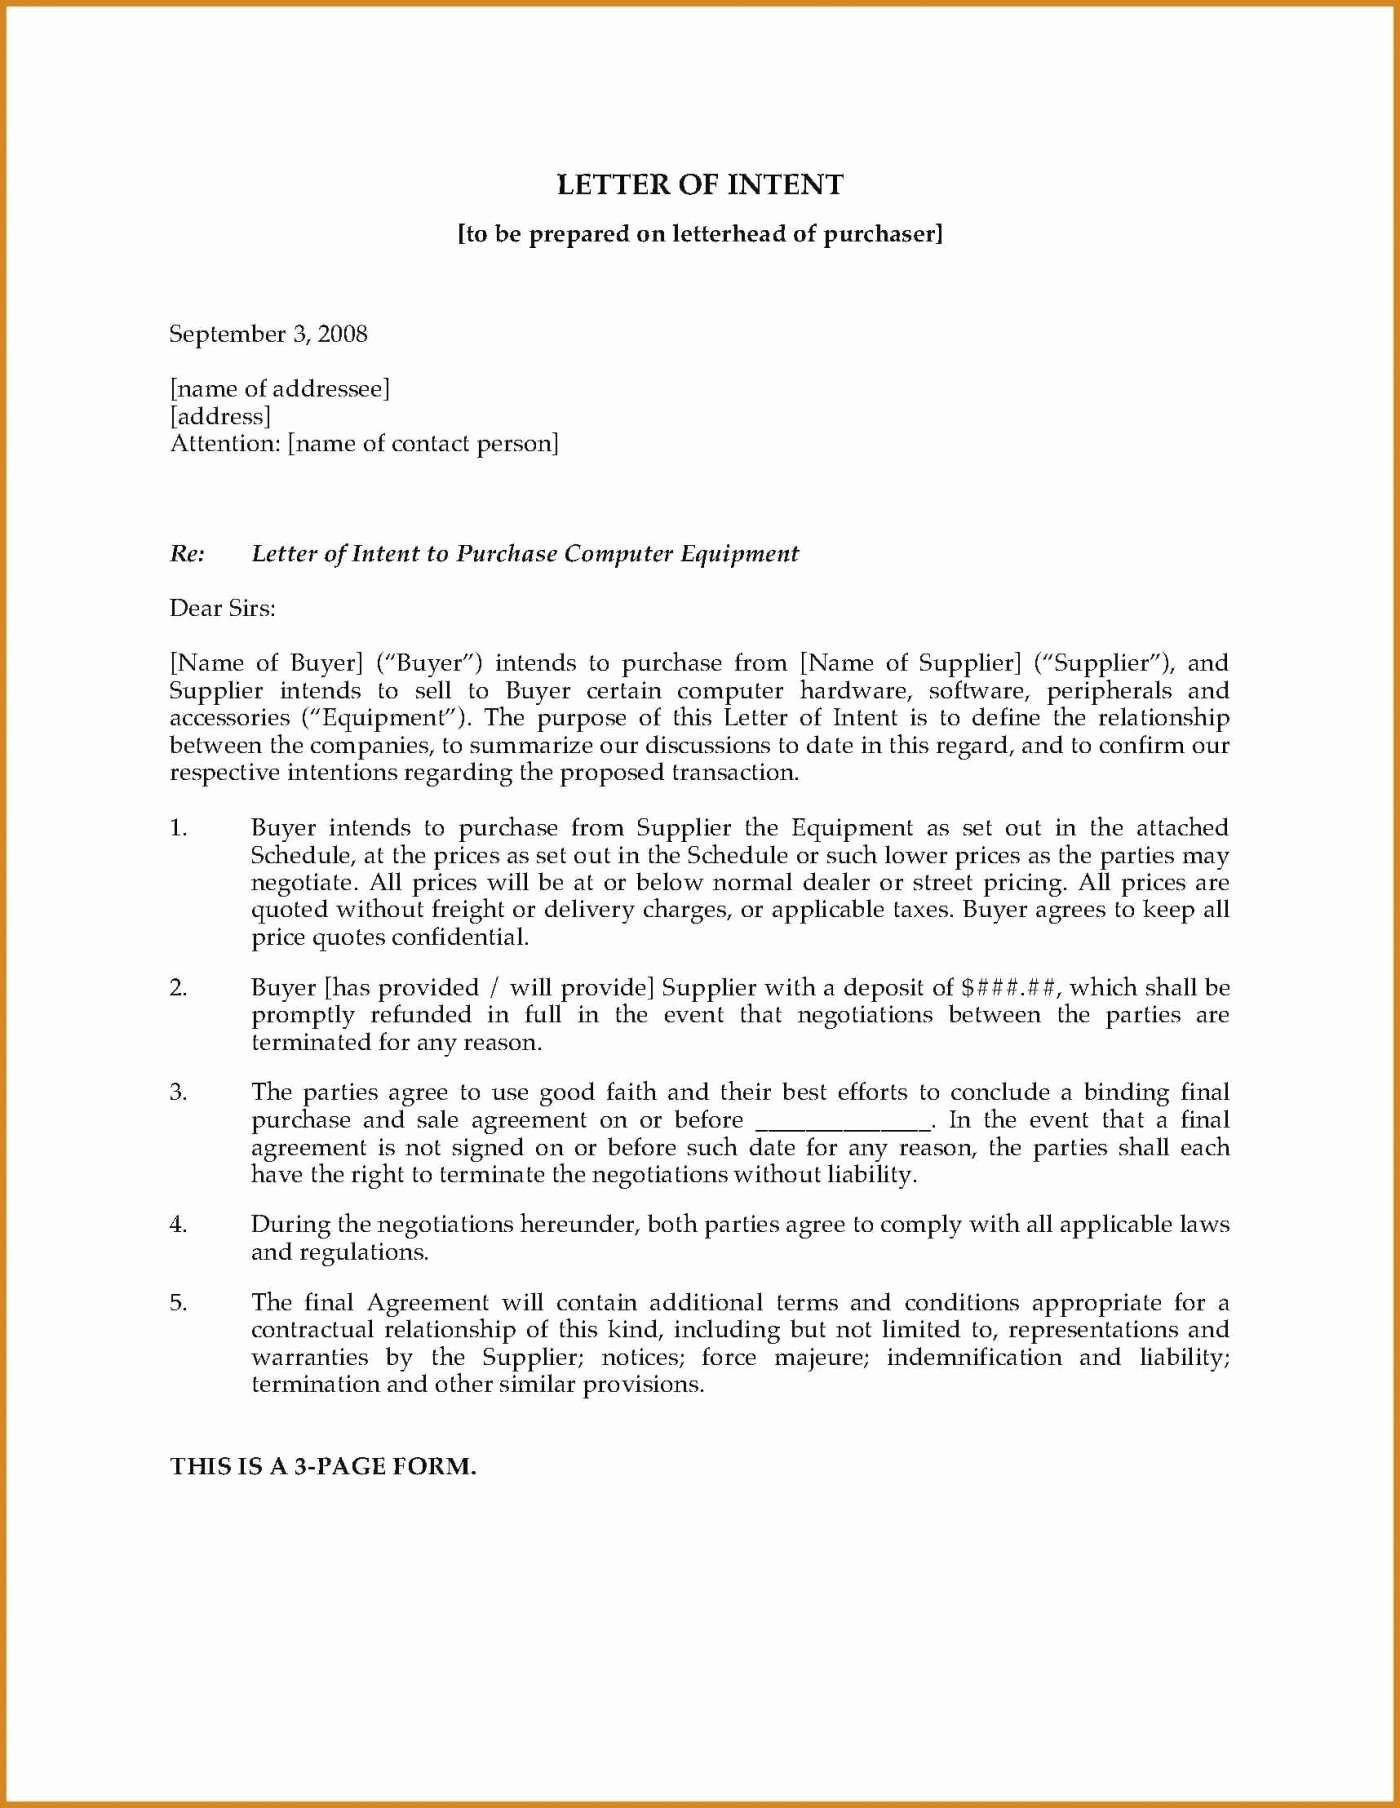 Private Placement Memorandum Template Inspirational New Private Placement Memorandum format